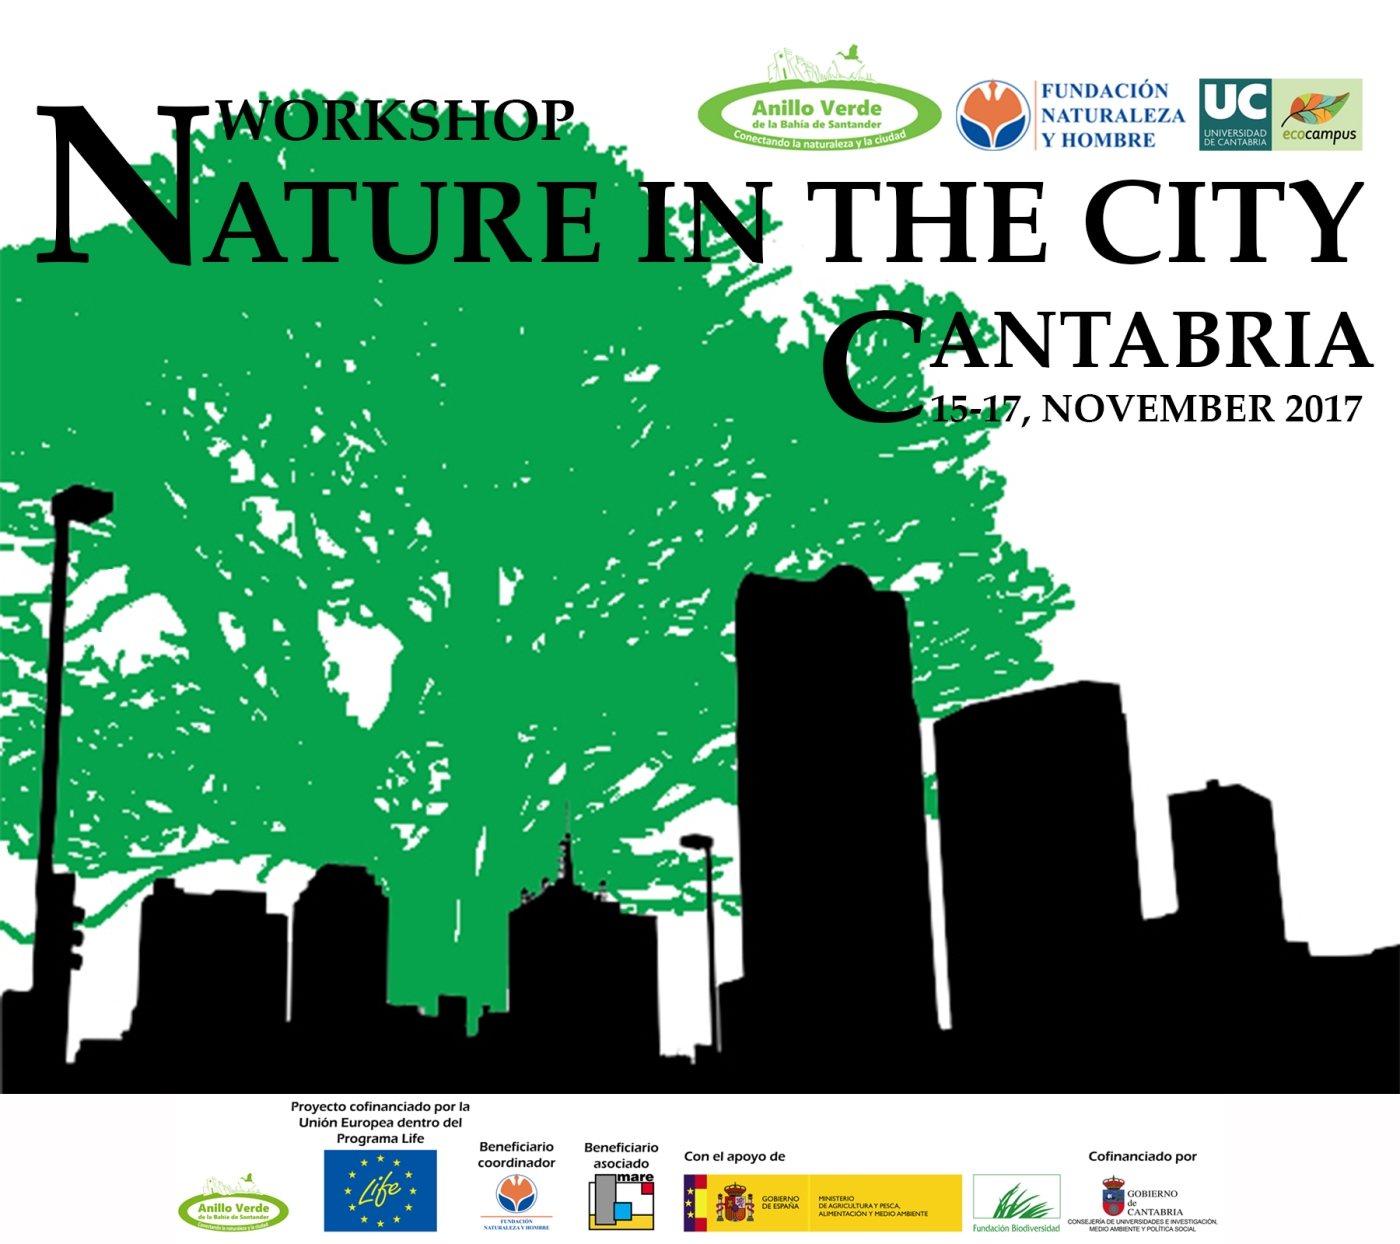 Workshop Nature In The City, 15-17 Nov 2017